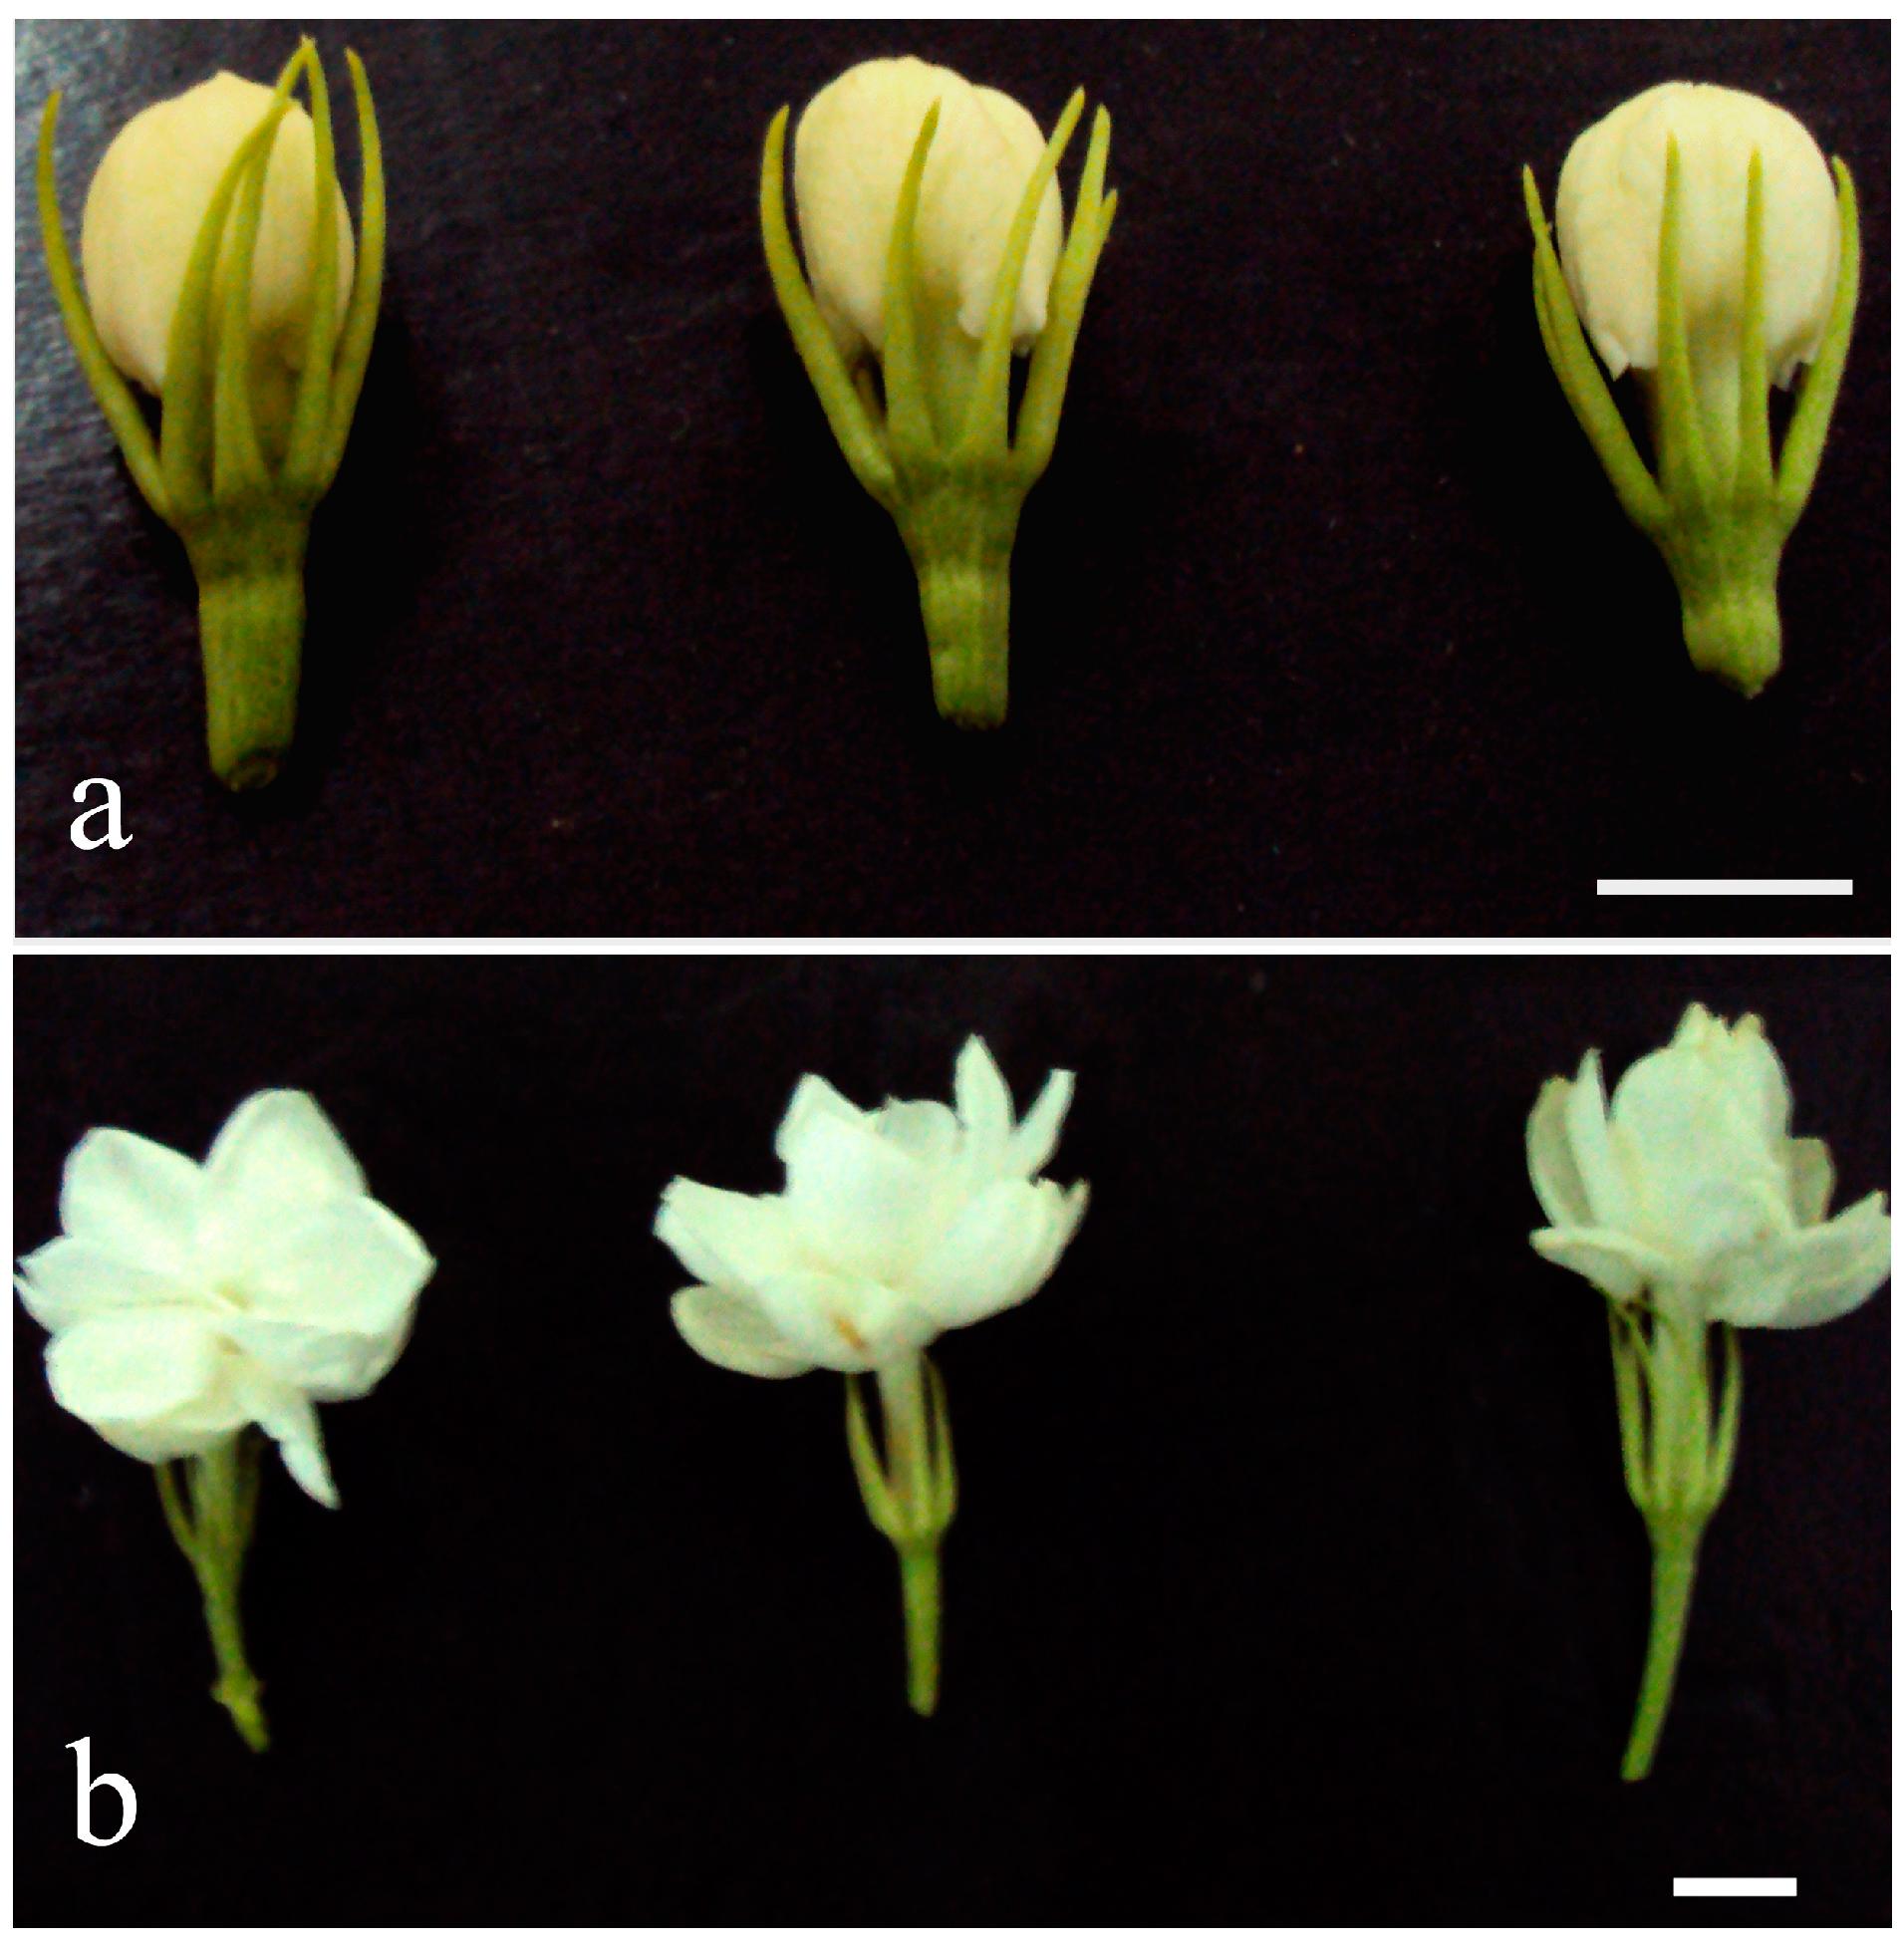 Molecules free full text transcriptomic analysis of flower molecules 20 10734 g001 izmirmasajfo